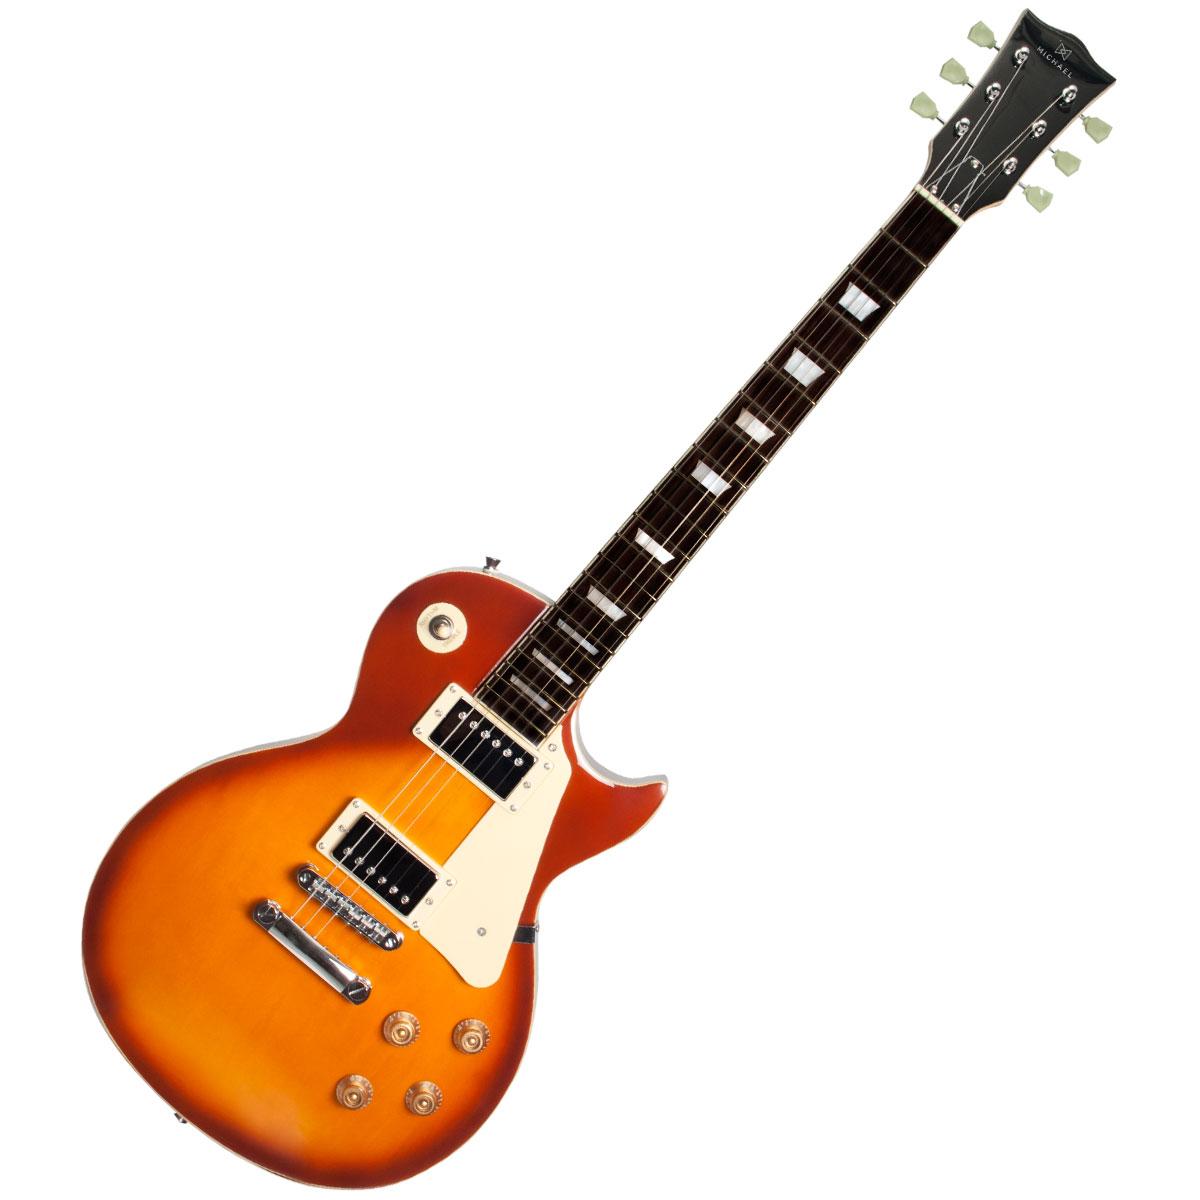 Guitara Les Paul Strike GM750 VS Vintage Sunburst - Michael